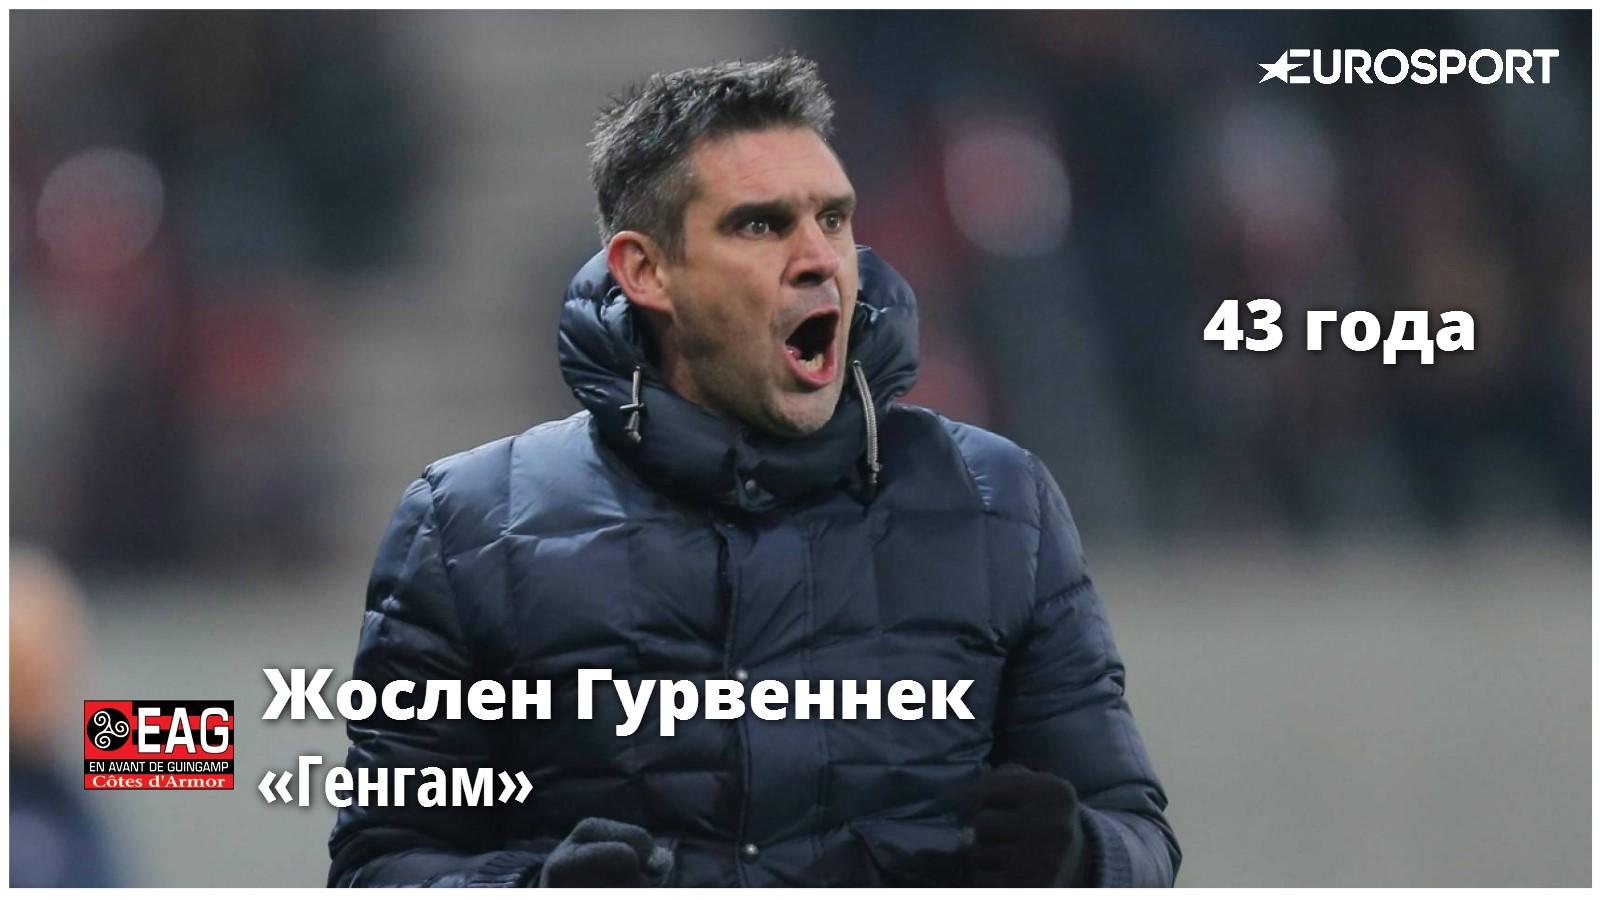 Жослен Гурвеннек